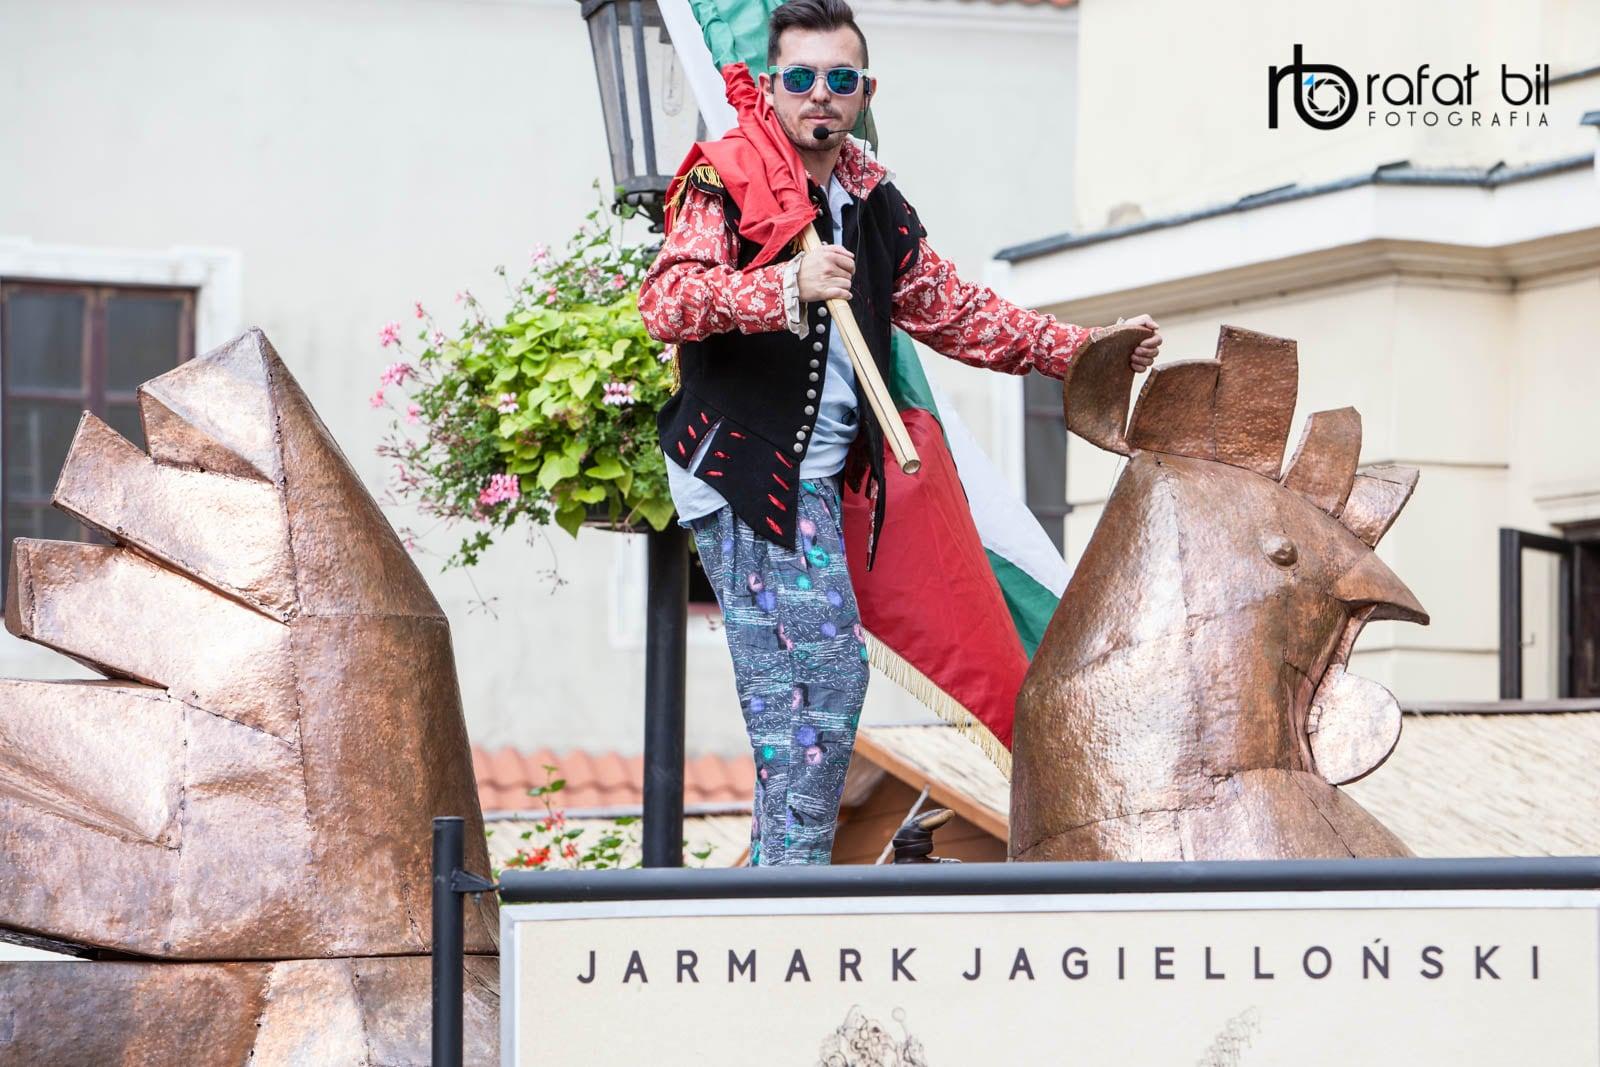 jarmark jagielloński 2016 Lublin (4)